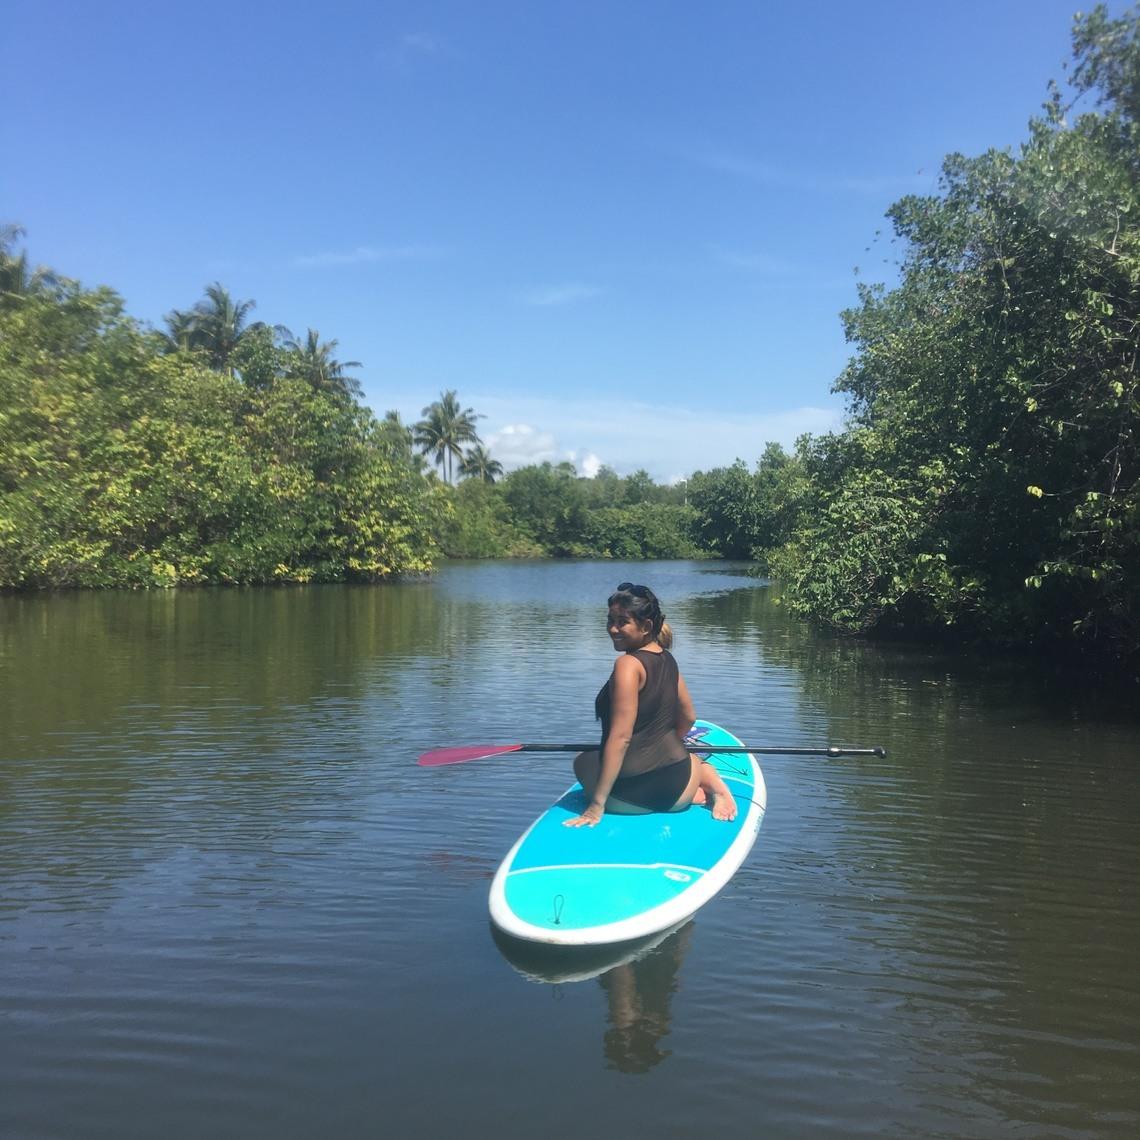 Paddle boarding in Jupiter's Intercoastal Waterway